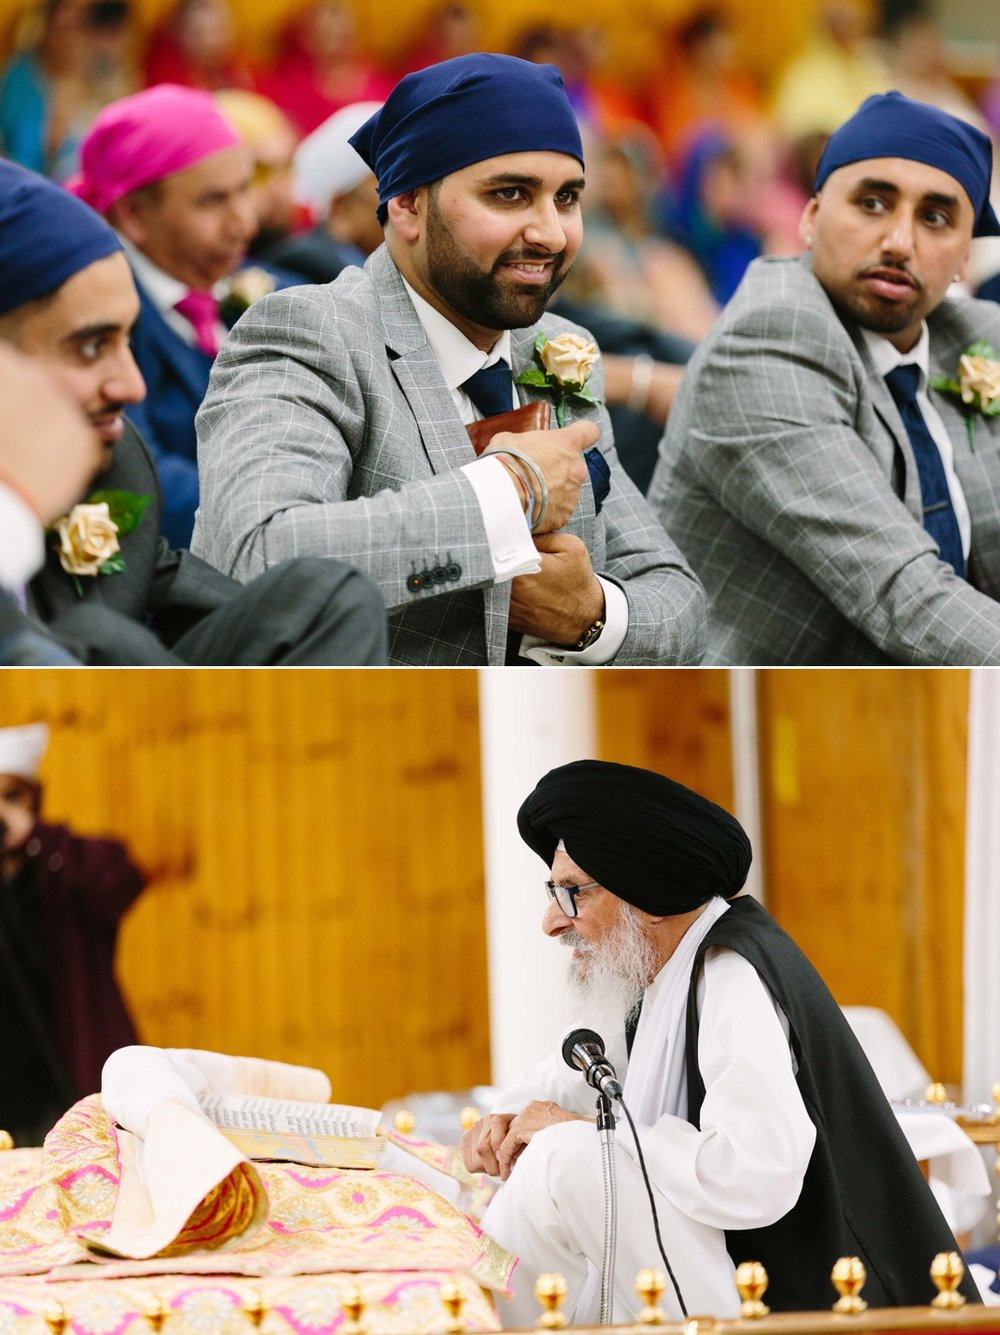 Gurpreet and Nick Sikh Wedding - Southampton - Photos by Abhi 16.jpg